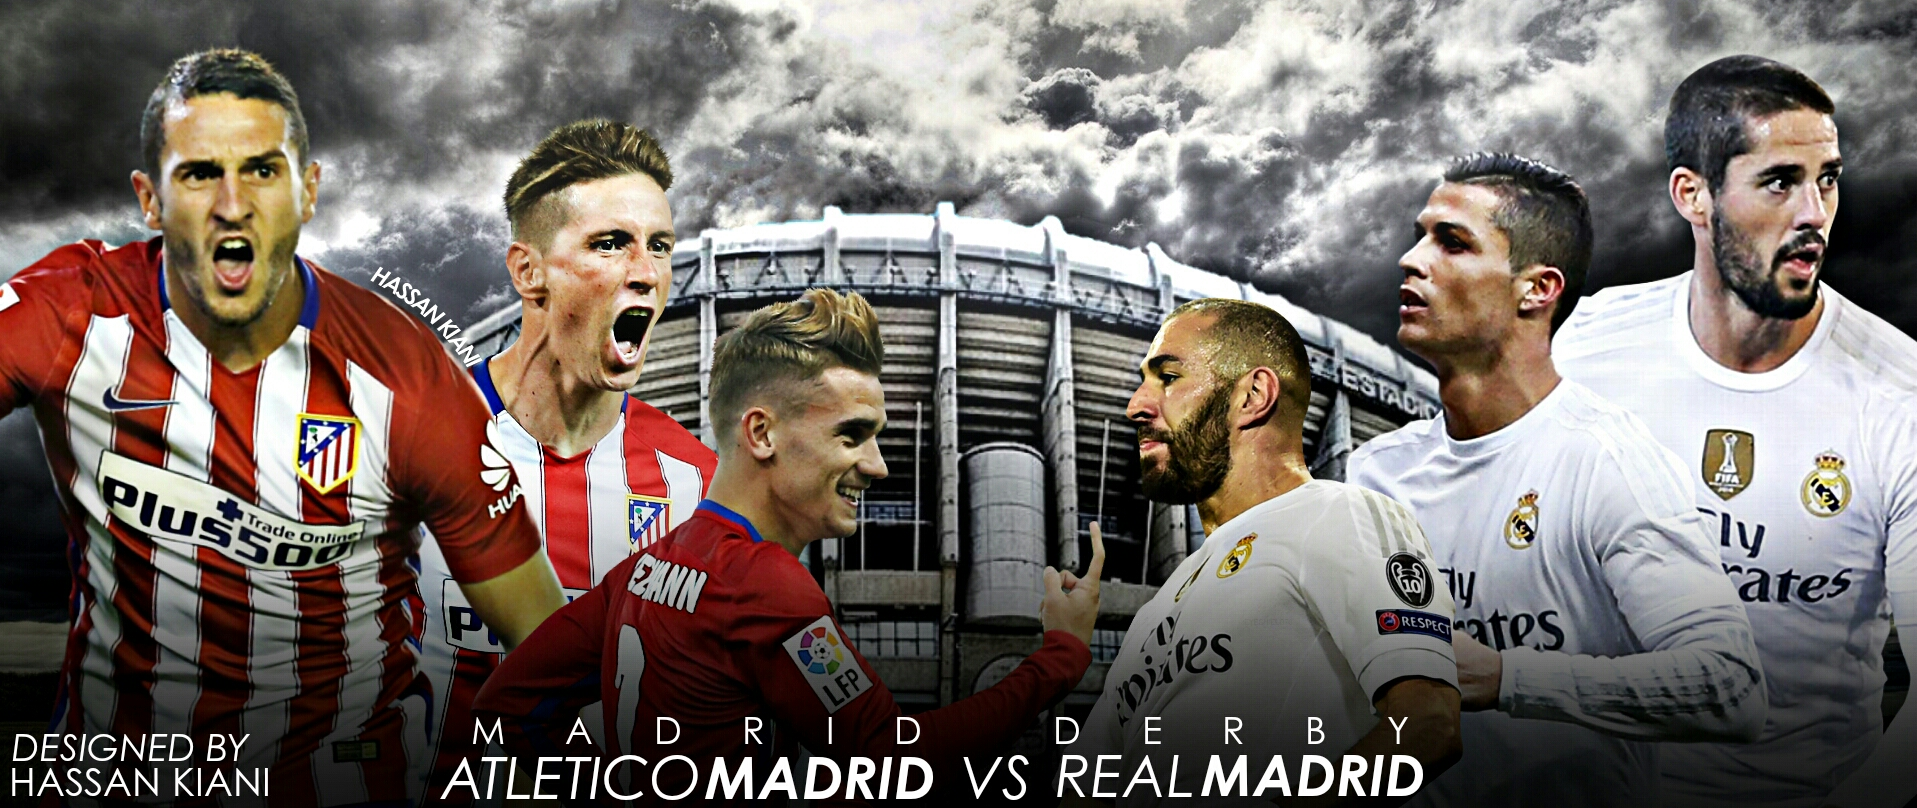 real madrid vs atl���tico madrid - photo #9